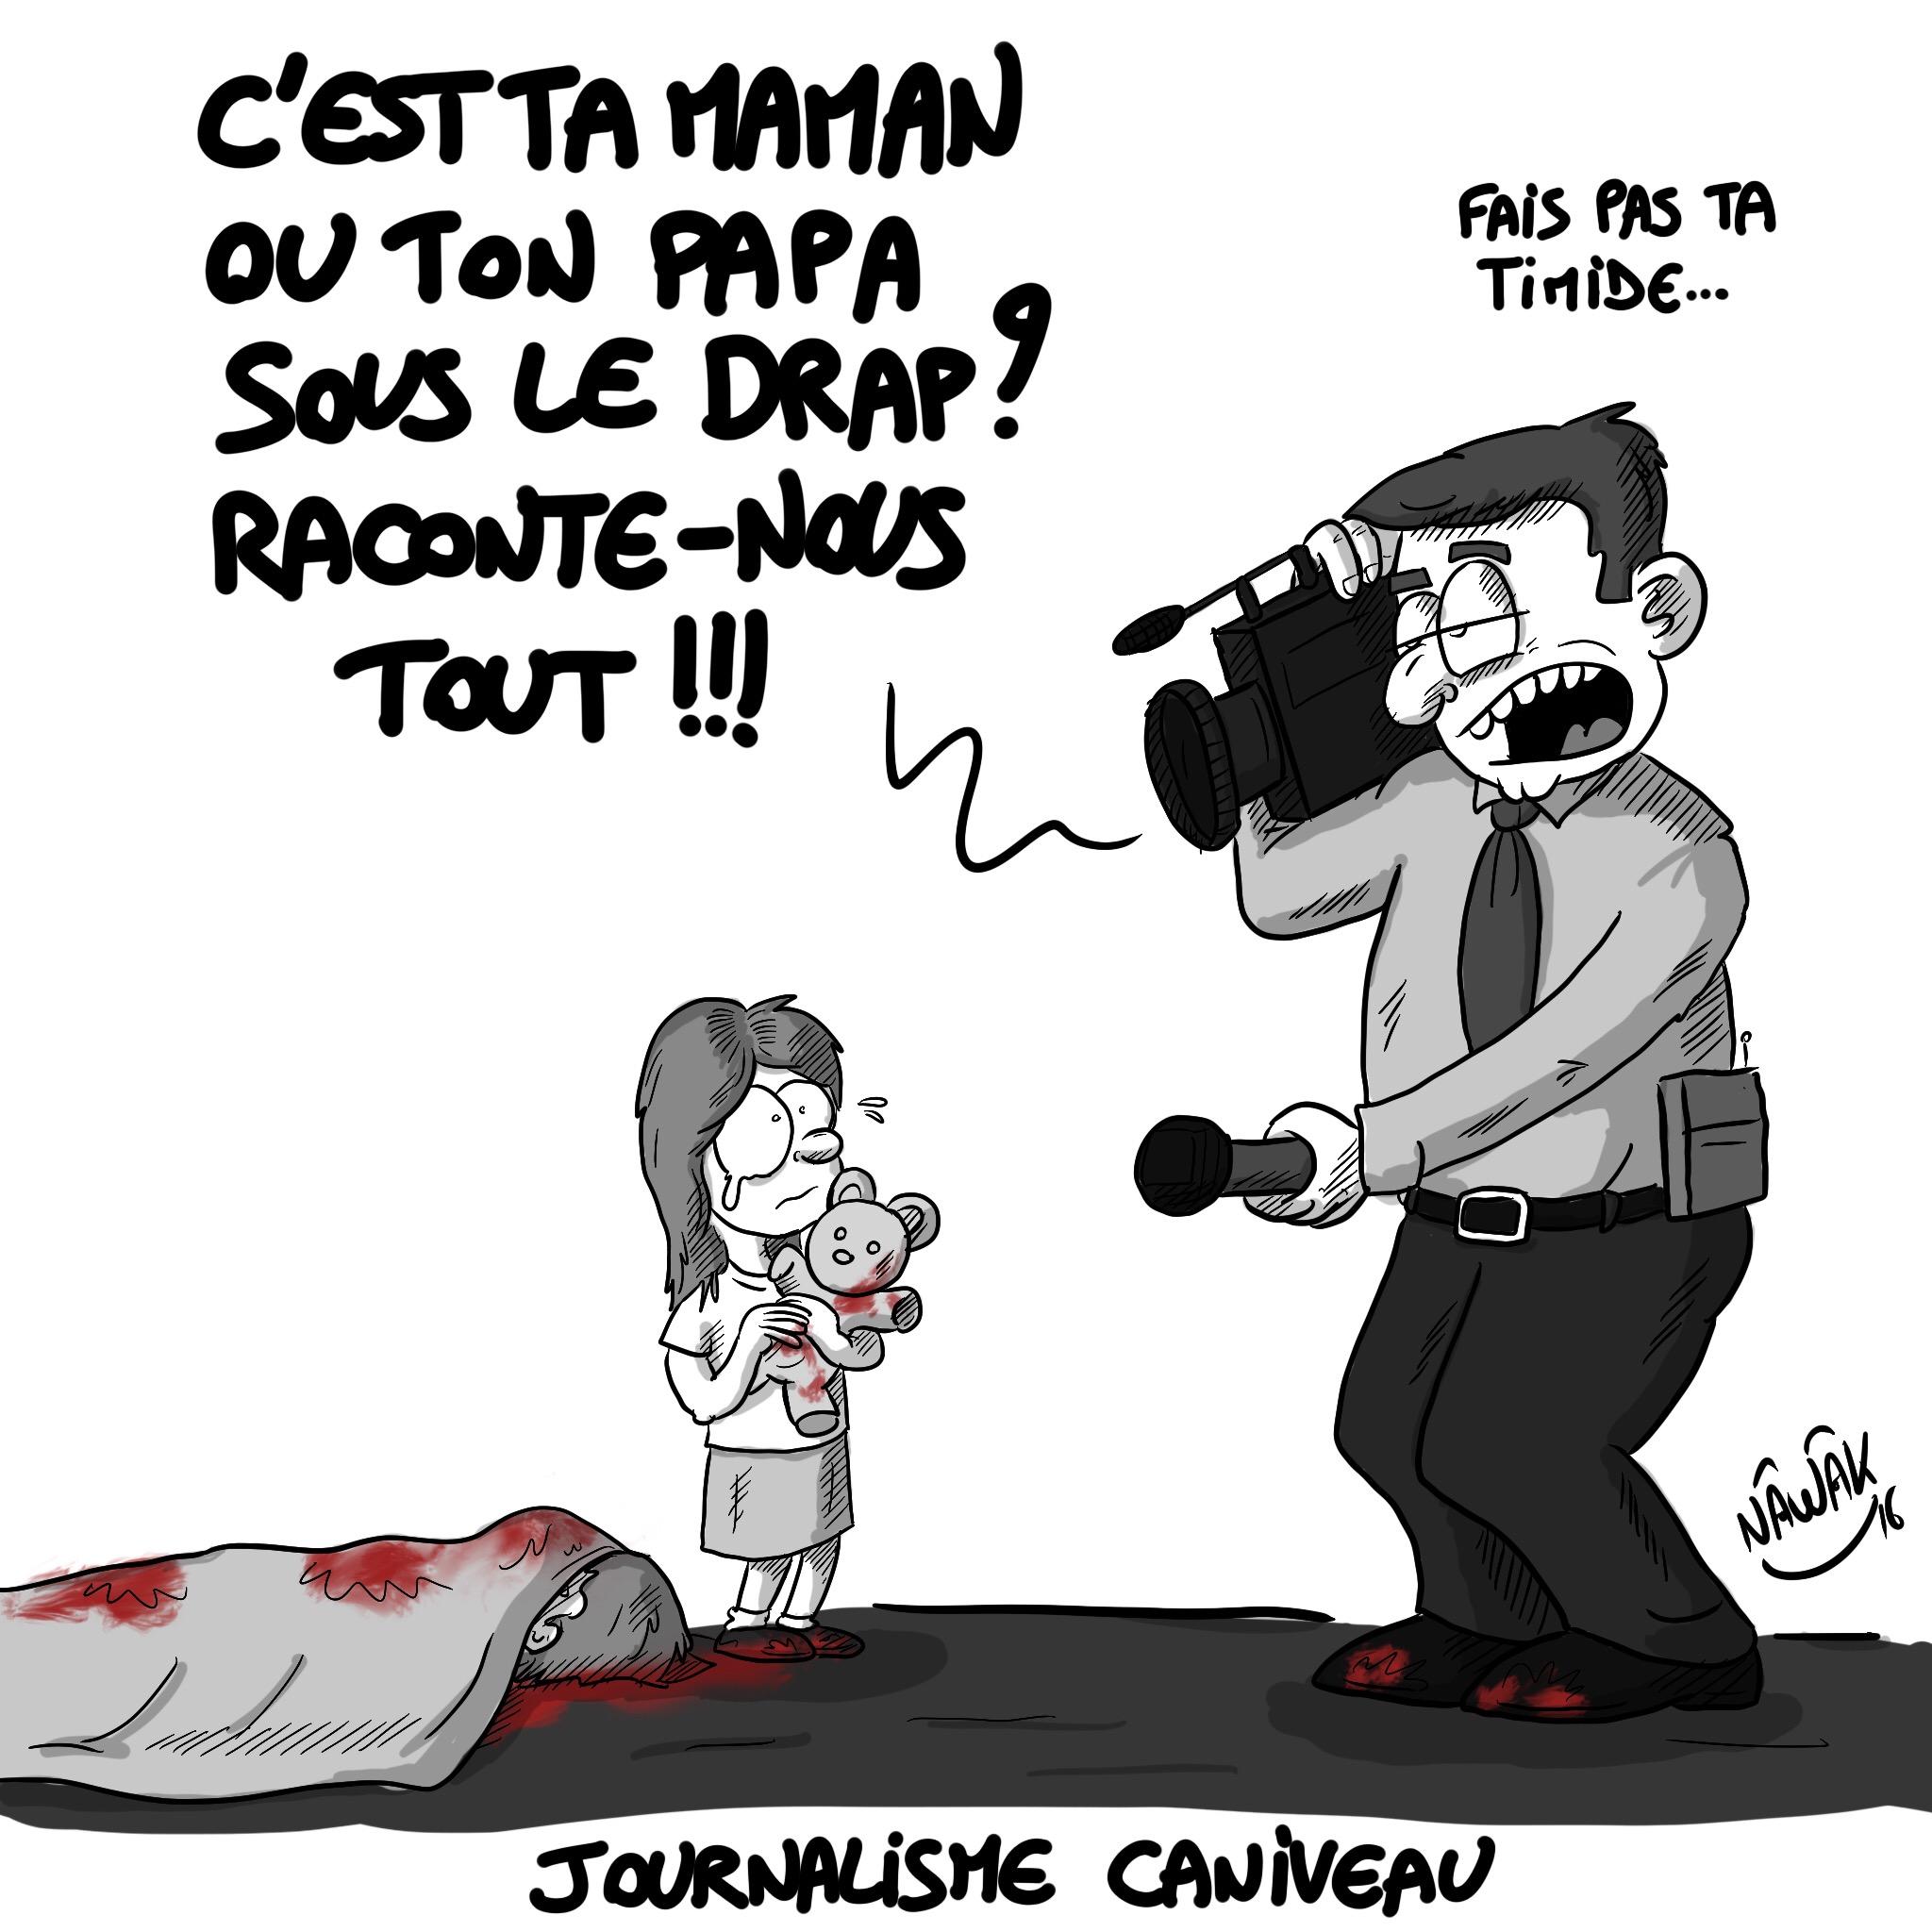 Journalisme caniveau